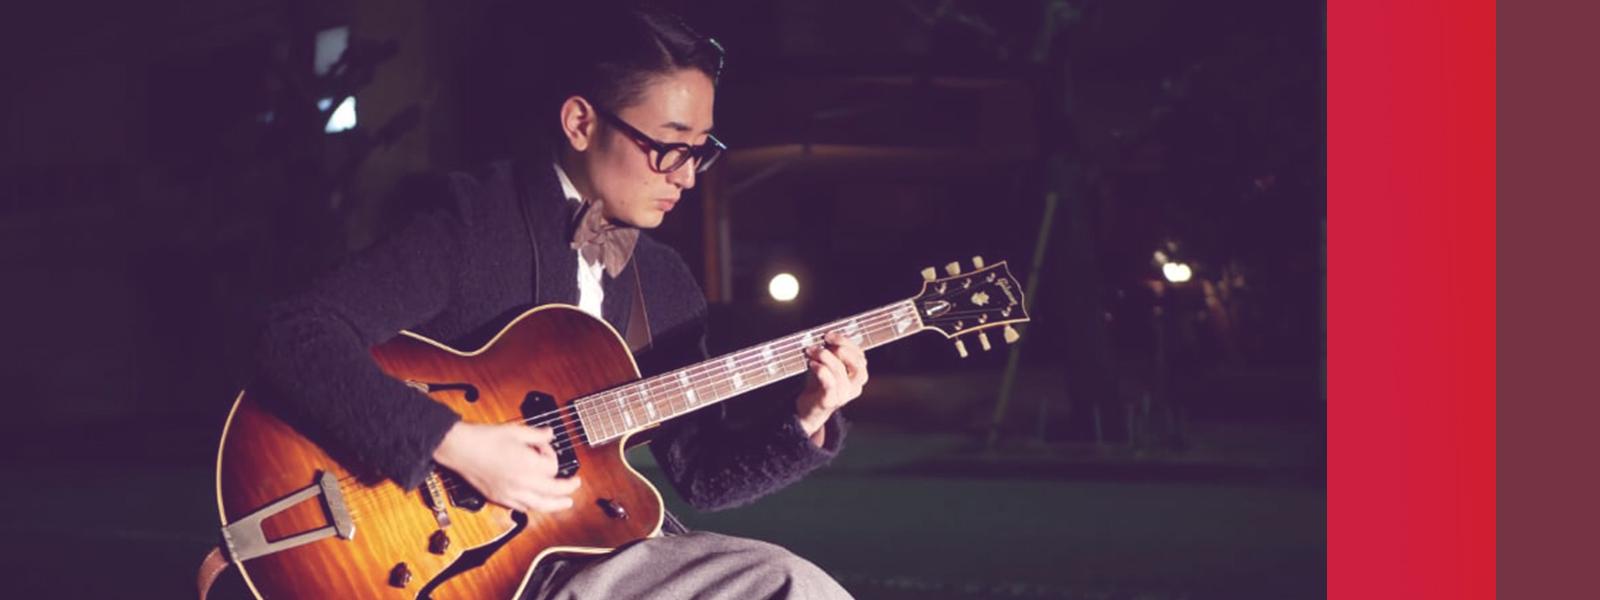 Jazz Guitarist Hirofumi Asaba ジャズギタリスト 浅葉裕文